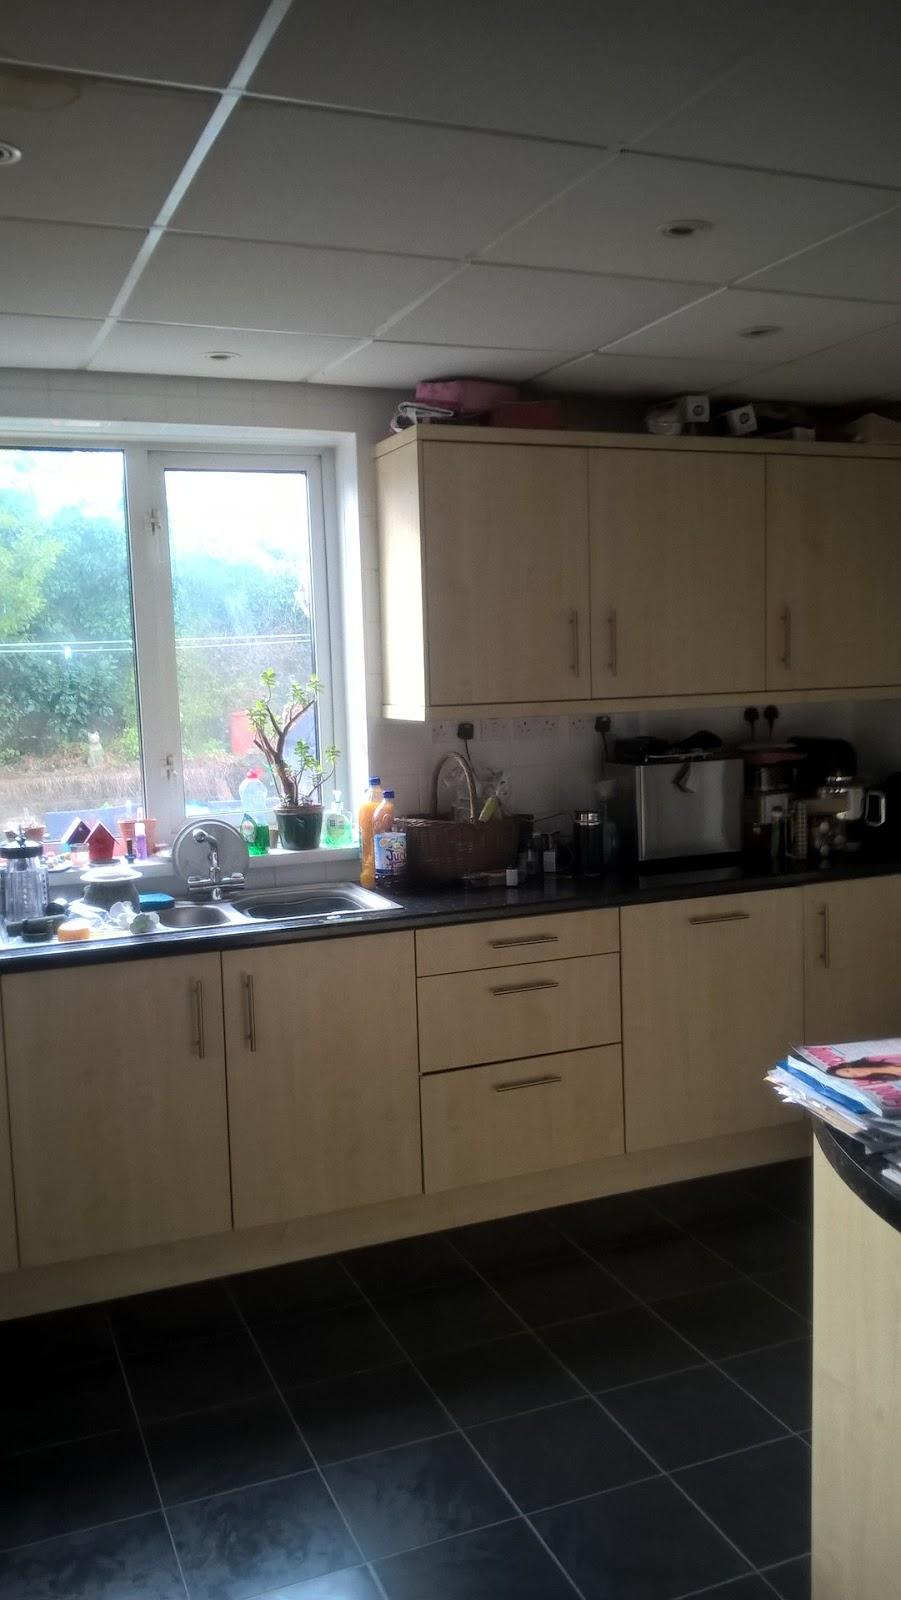 Hobbis Family Kitchen Sink - Kitchen Design - motherdistracted.co.uk